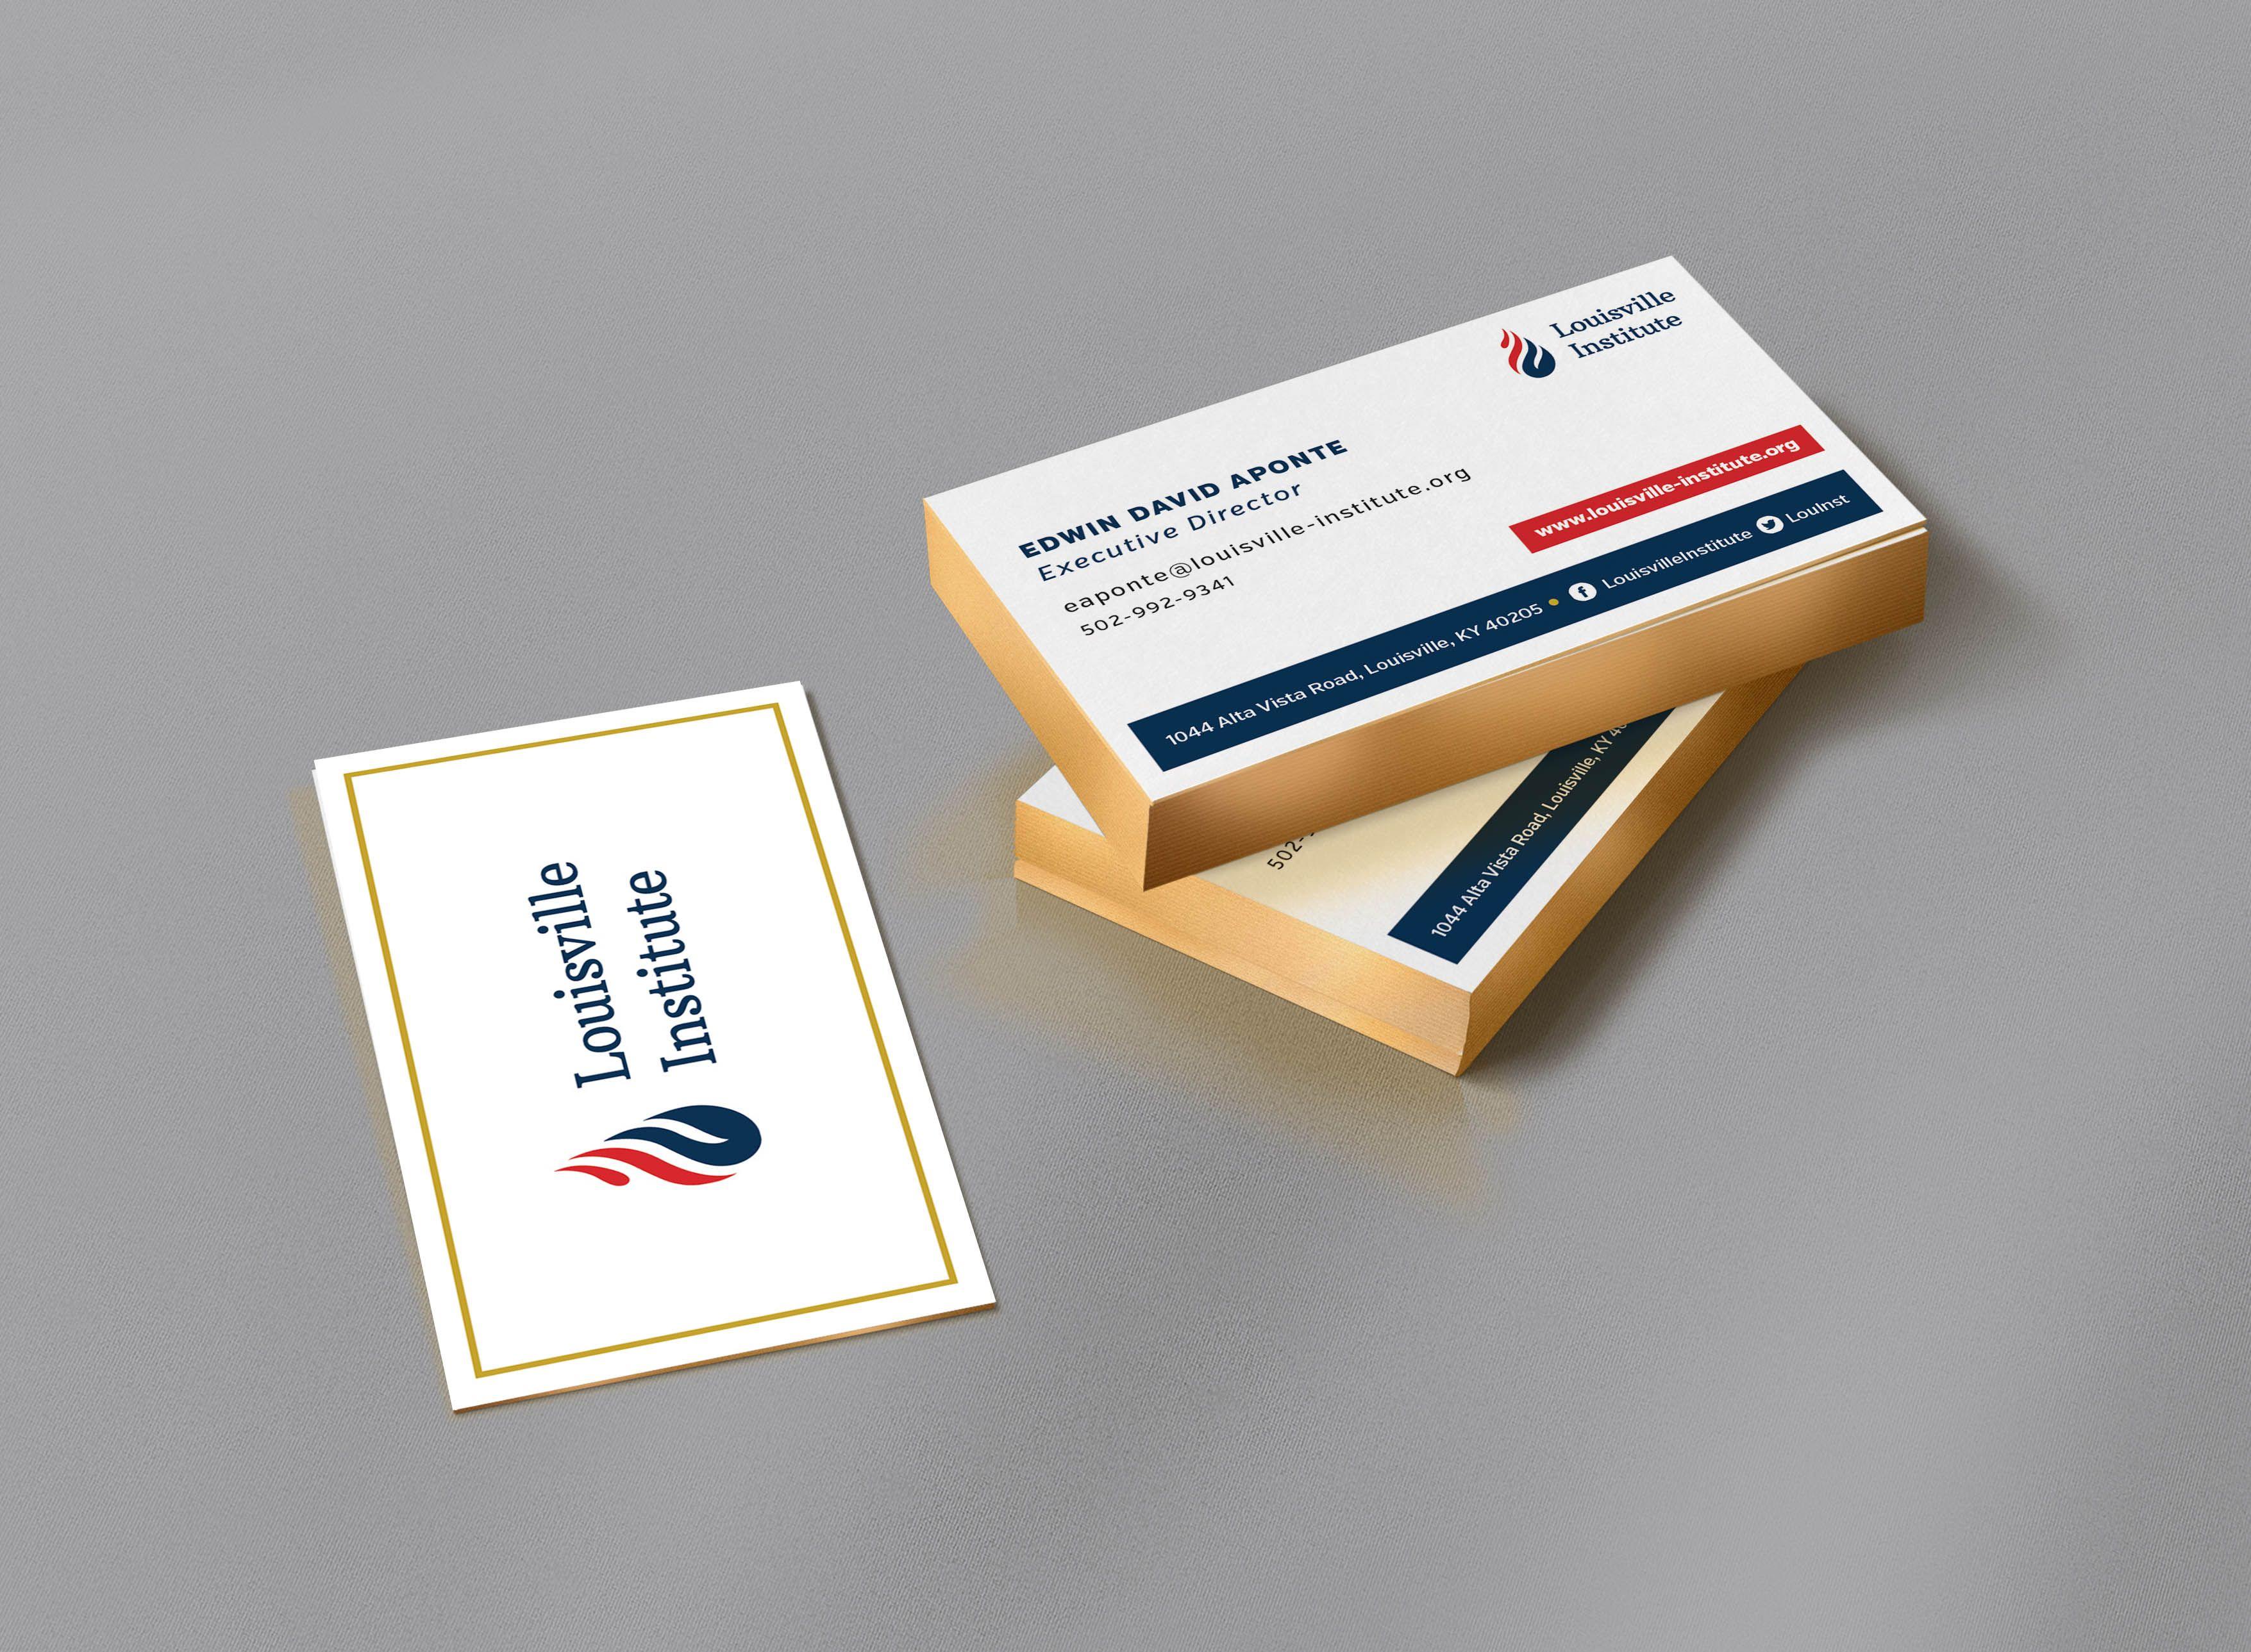 LI business cards.jpg